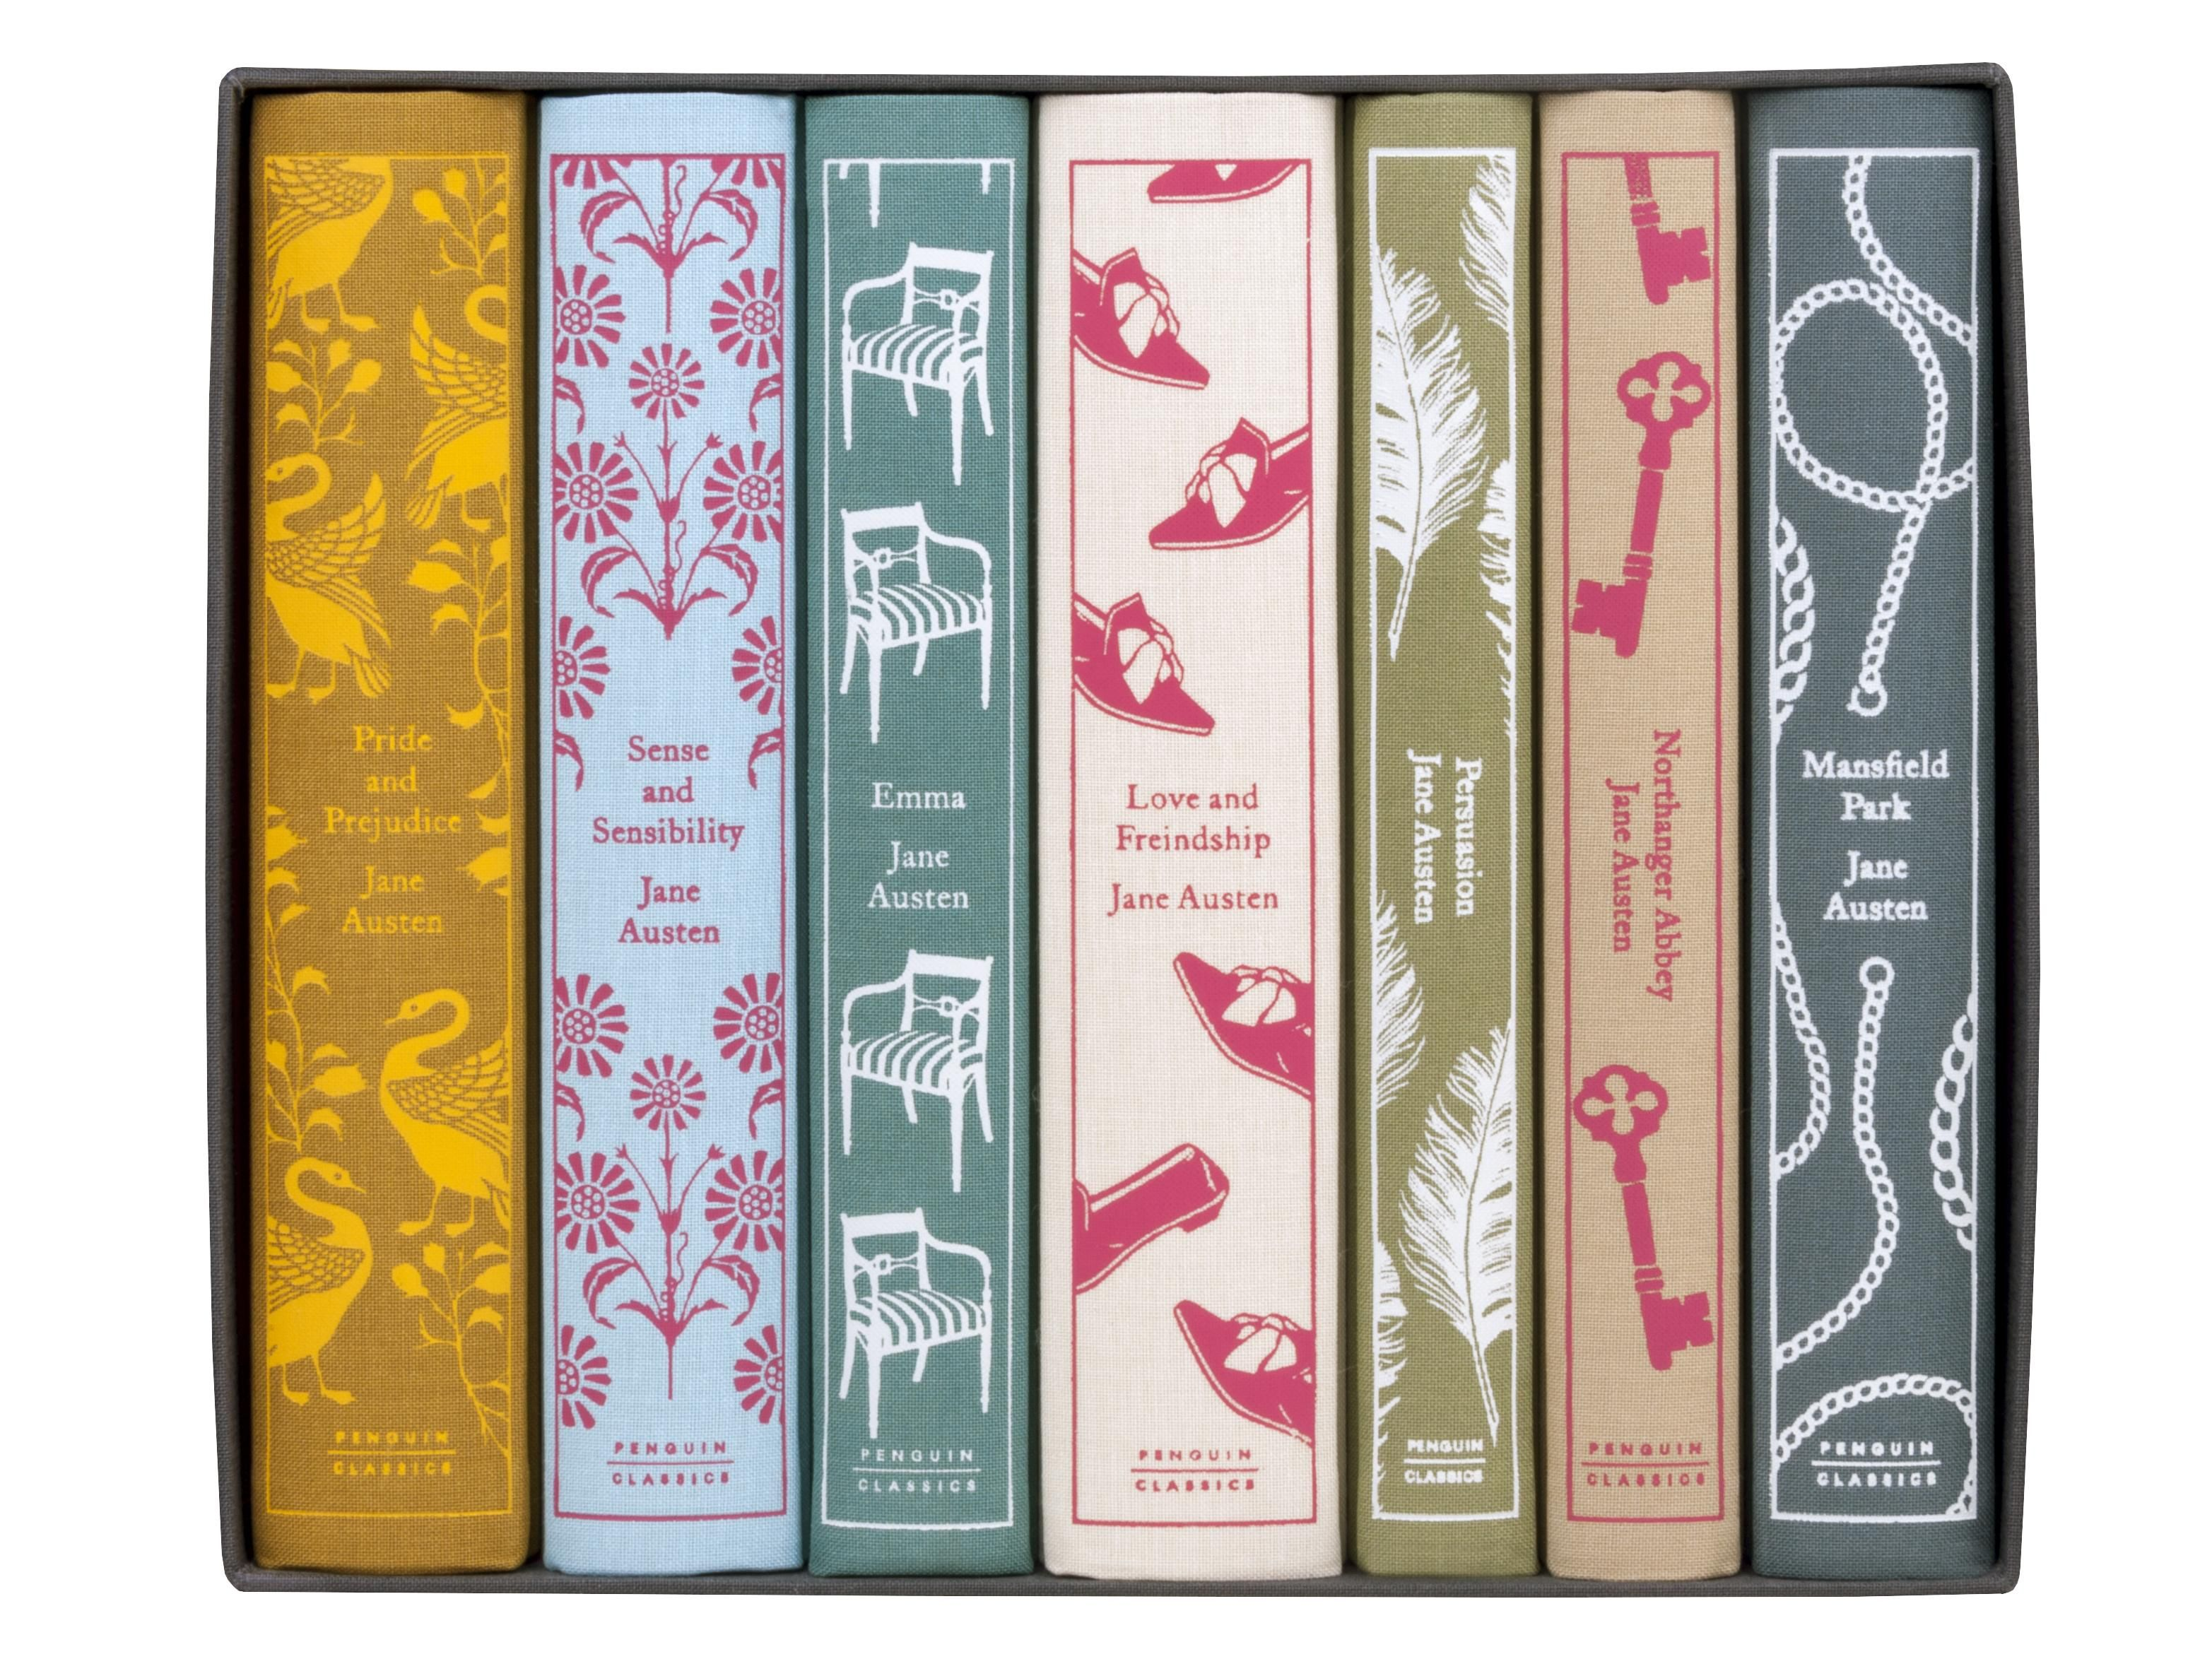 Penguin Classics Juniper Edition Jane Austen Box Set Penguin Clothbound Classics Jane Austen Books Jane Austen Gifts